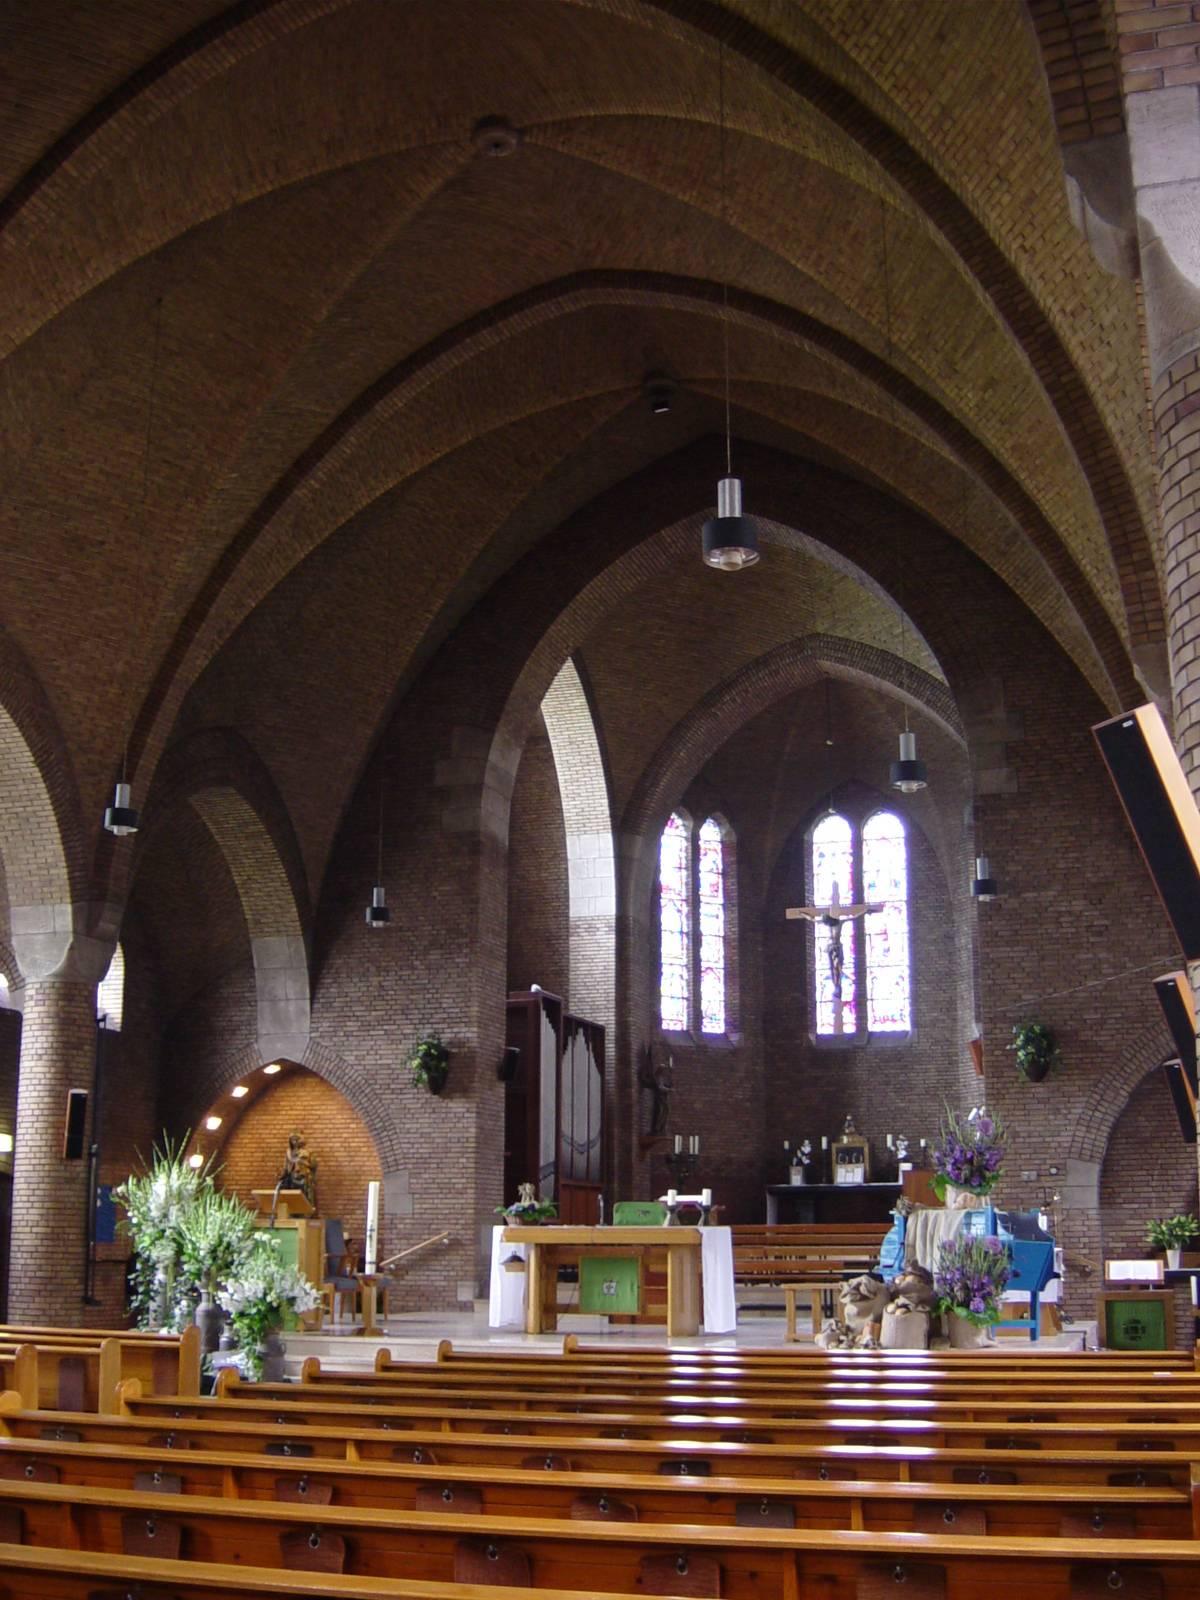 Bestand marienheem rk interieur reliwiki for Interieur 05 nl